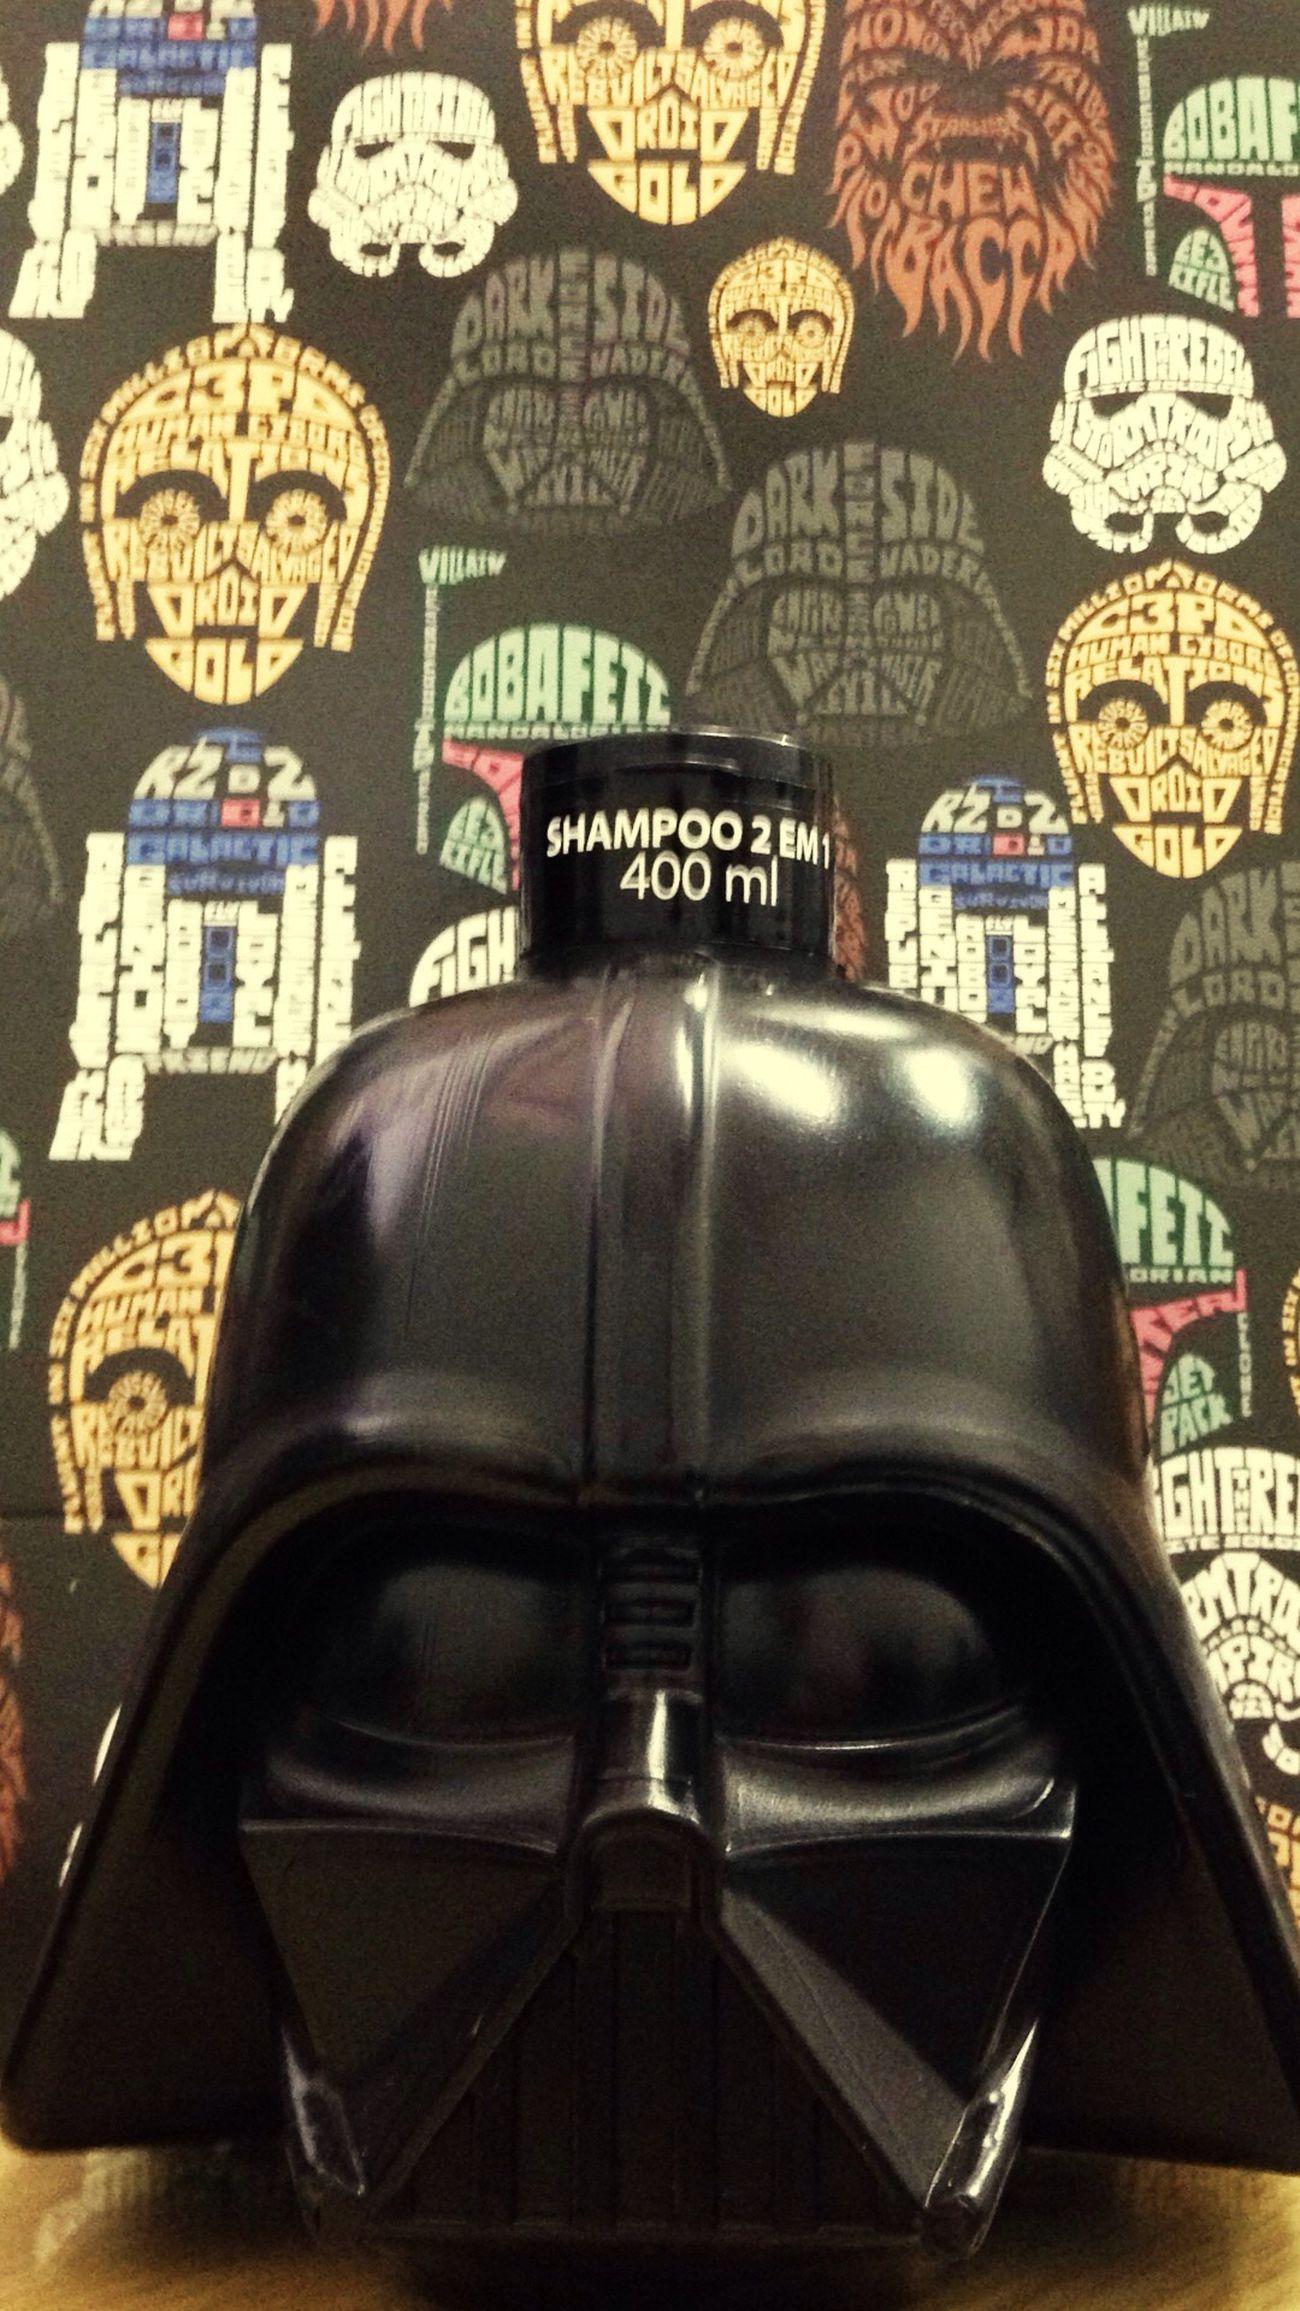 EyeEmNewHere Starwars Darth Vader Boba Fett C3po R2D2 Stormtrooper STARWARS